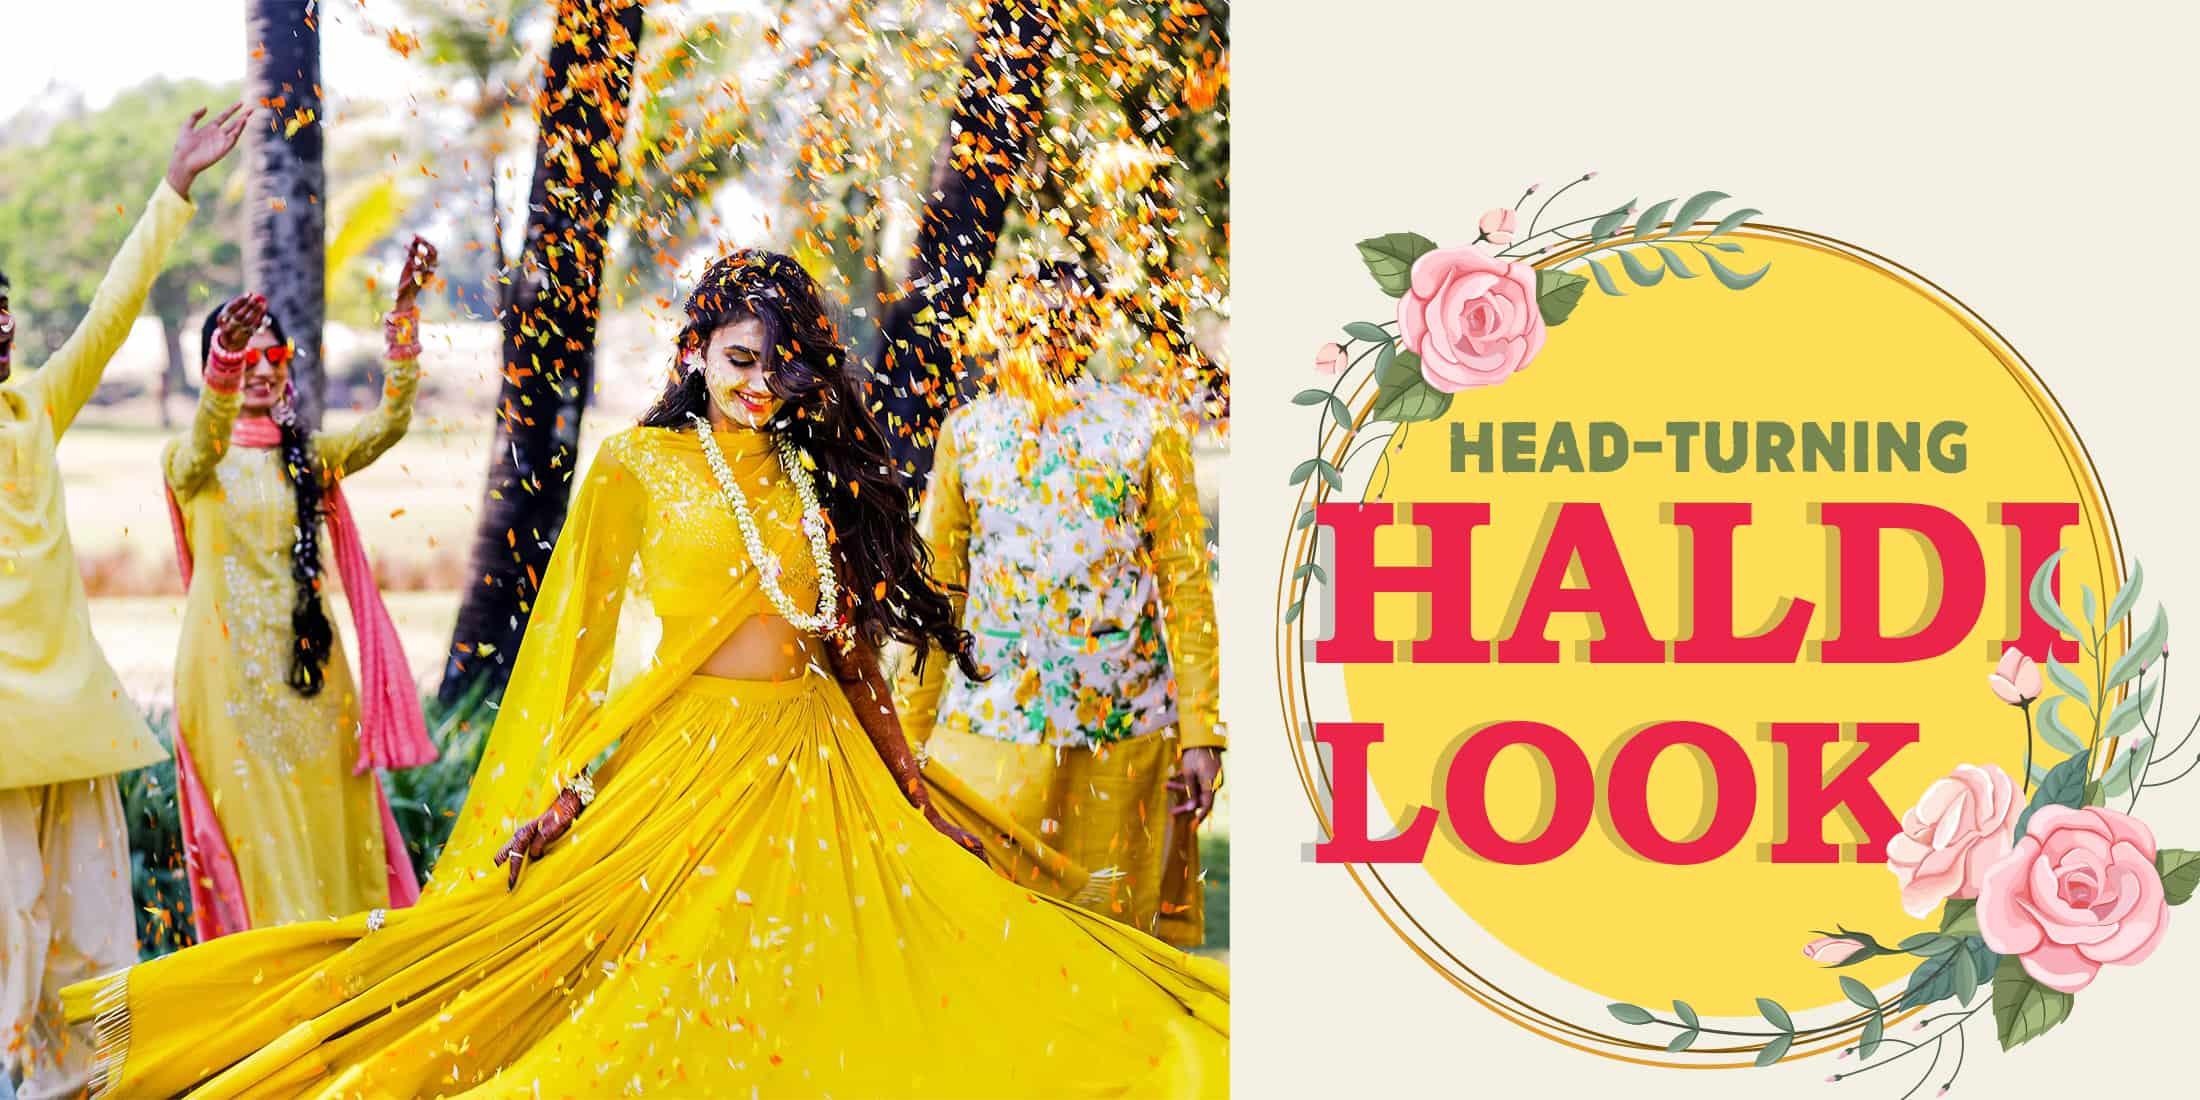 Best Haldi Dresses for Brides 2020 - Haldi Outfits for bridesmaids